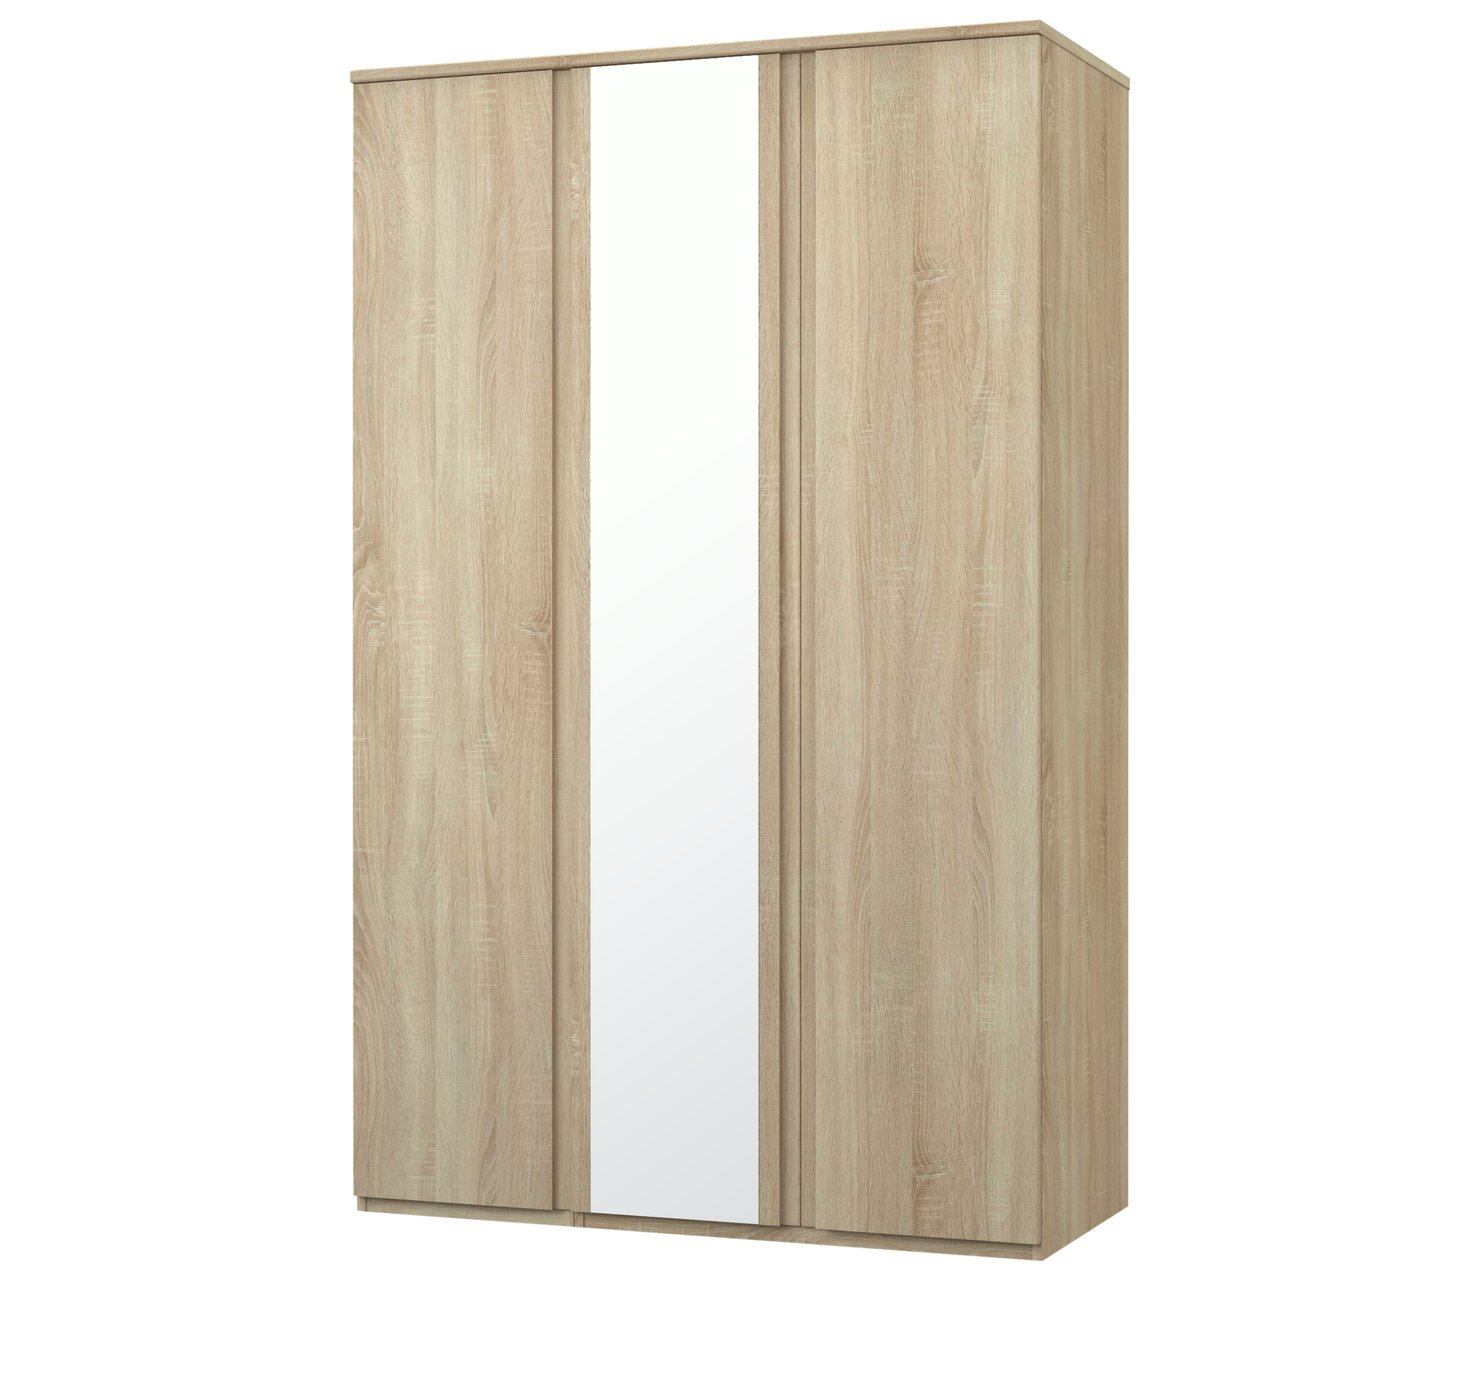 Image of Avenue 3 Door Mirrored Wardrobe - Natural Oak Effect